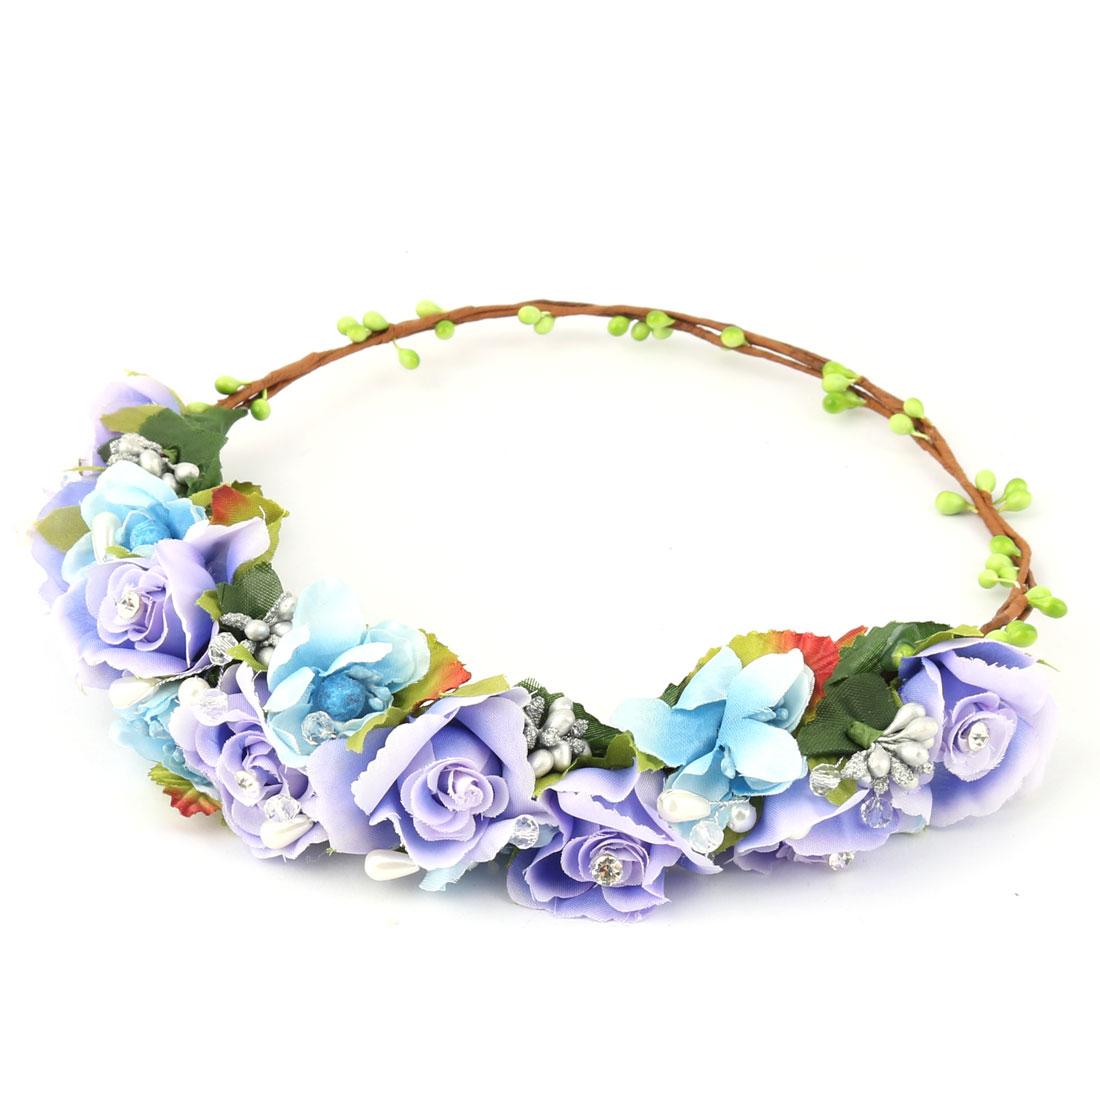 Wedding Women Cloth Imitation Pearl Decor Hair Wreaths Floral Flower Purple Blue